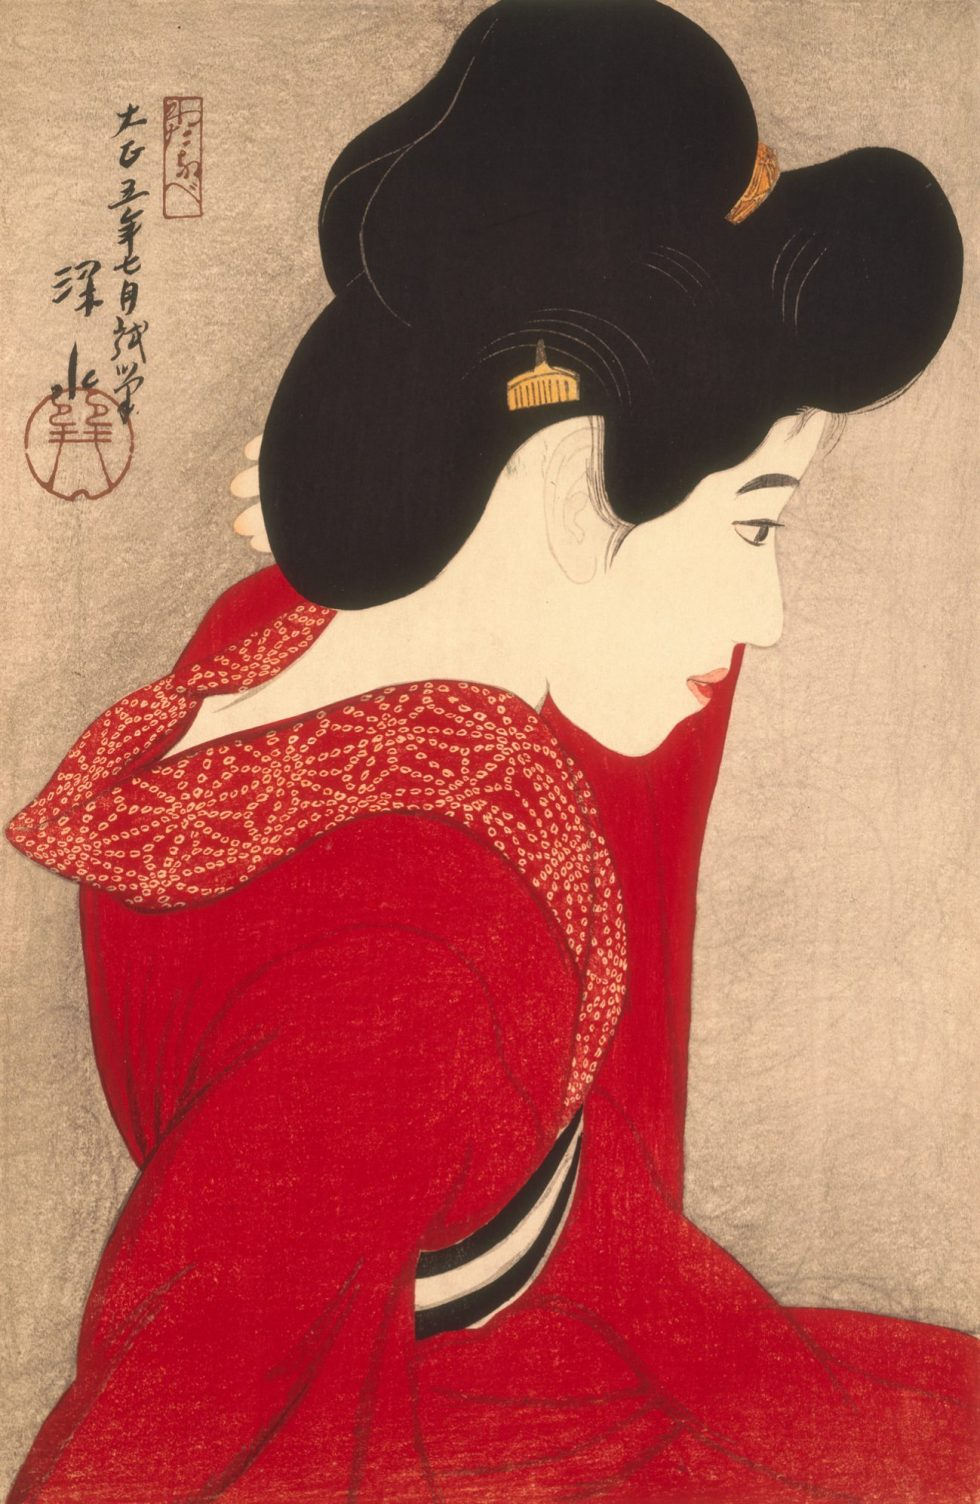 Itō Shinsui, Itō Shinsui - Vor dem Spiegel, Nostalgie in der Moderne,